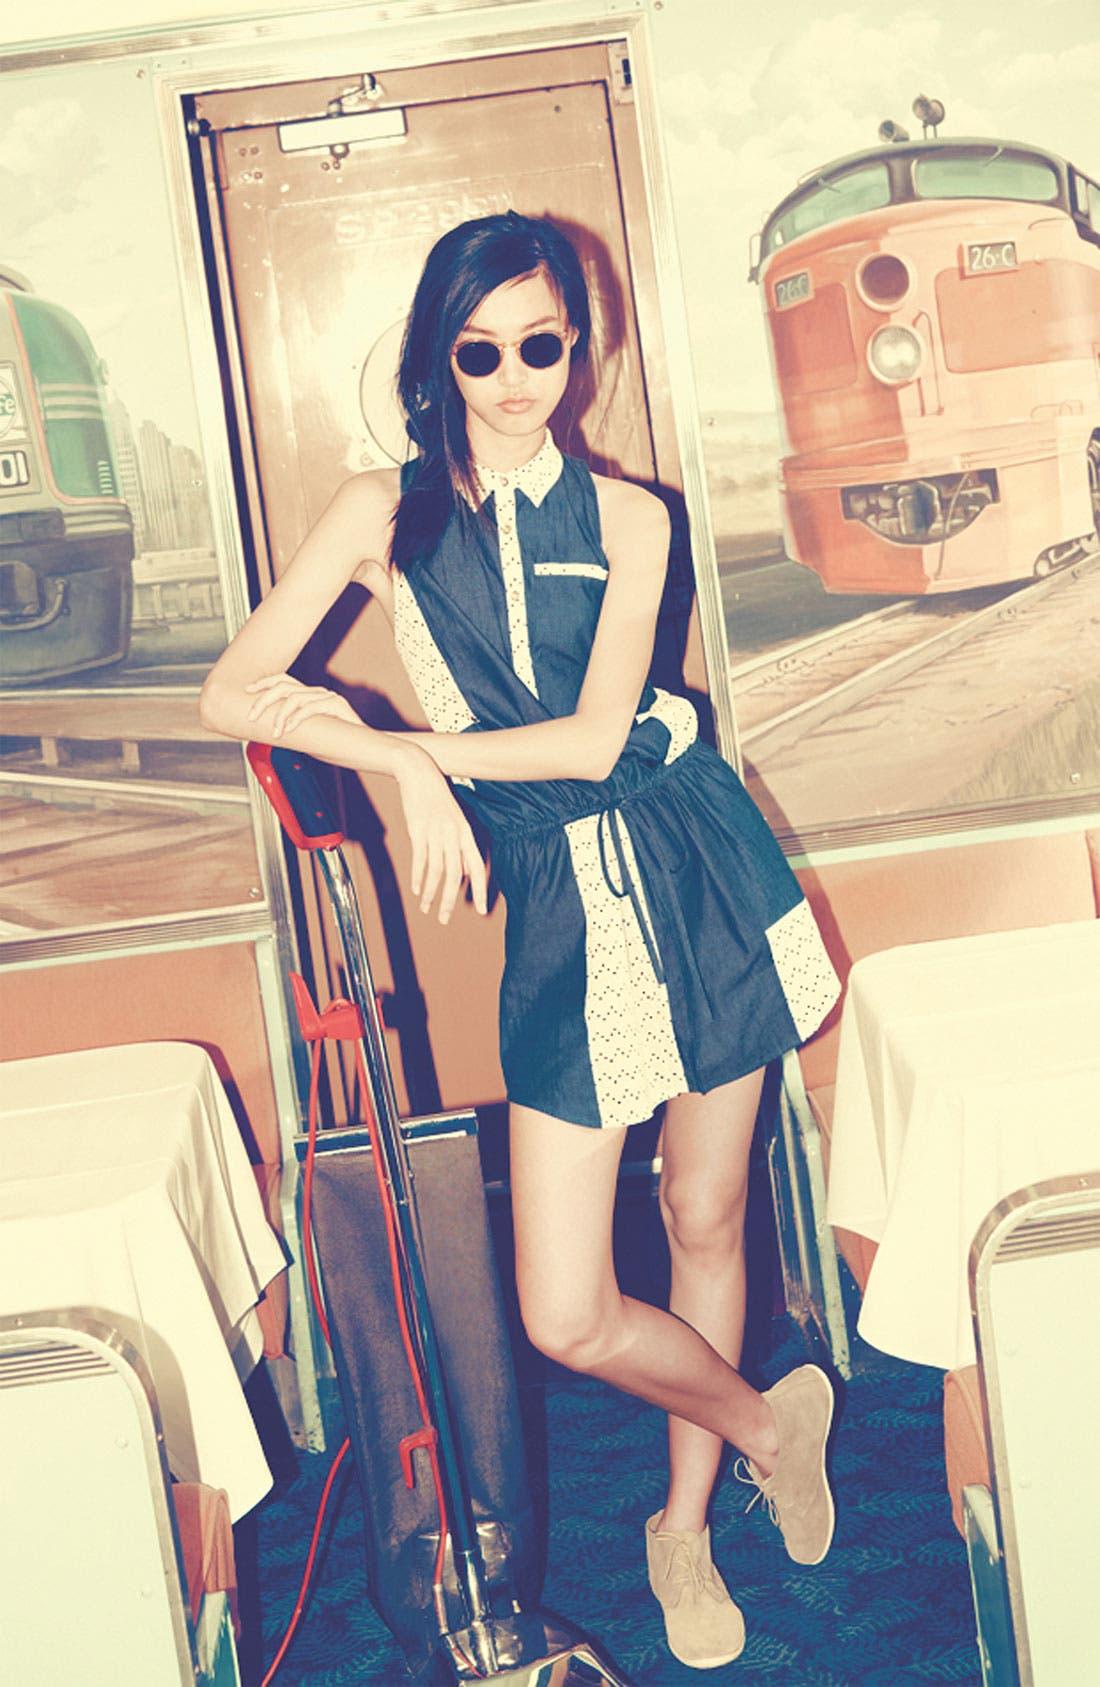 Main Image - Viva Vina! Dress & Accessories